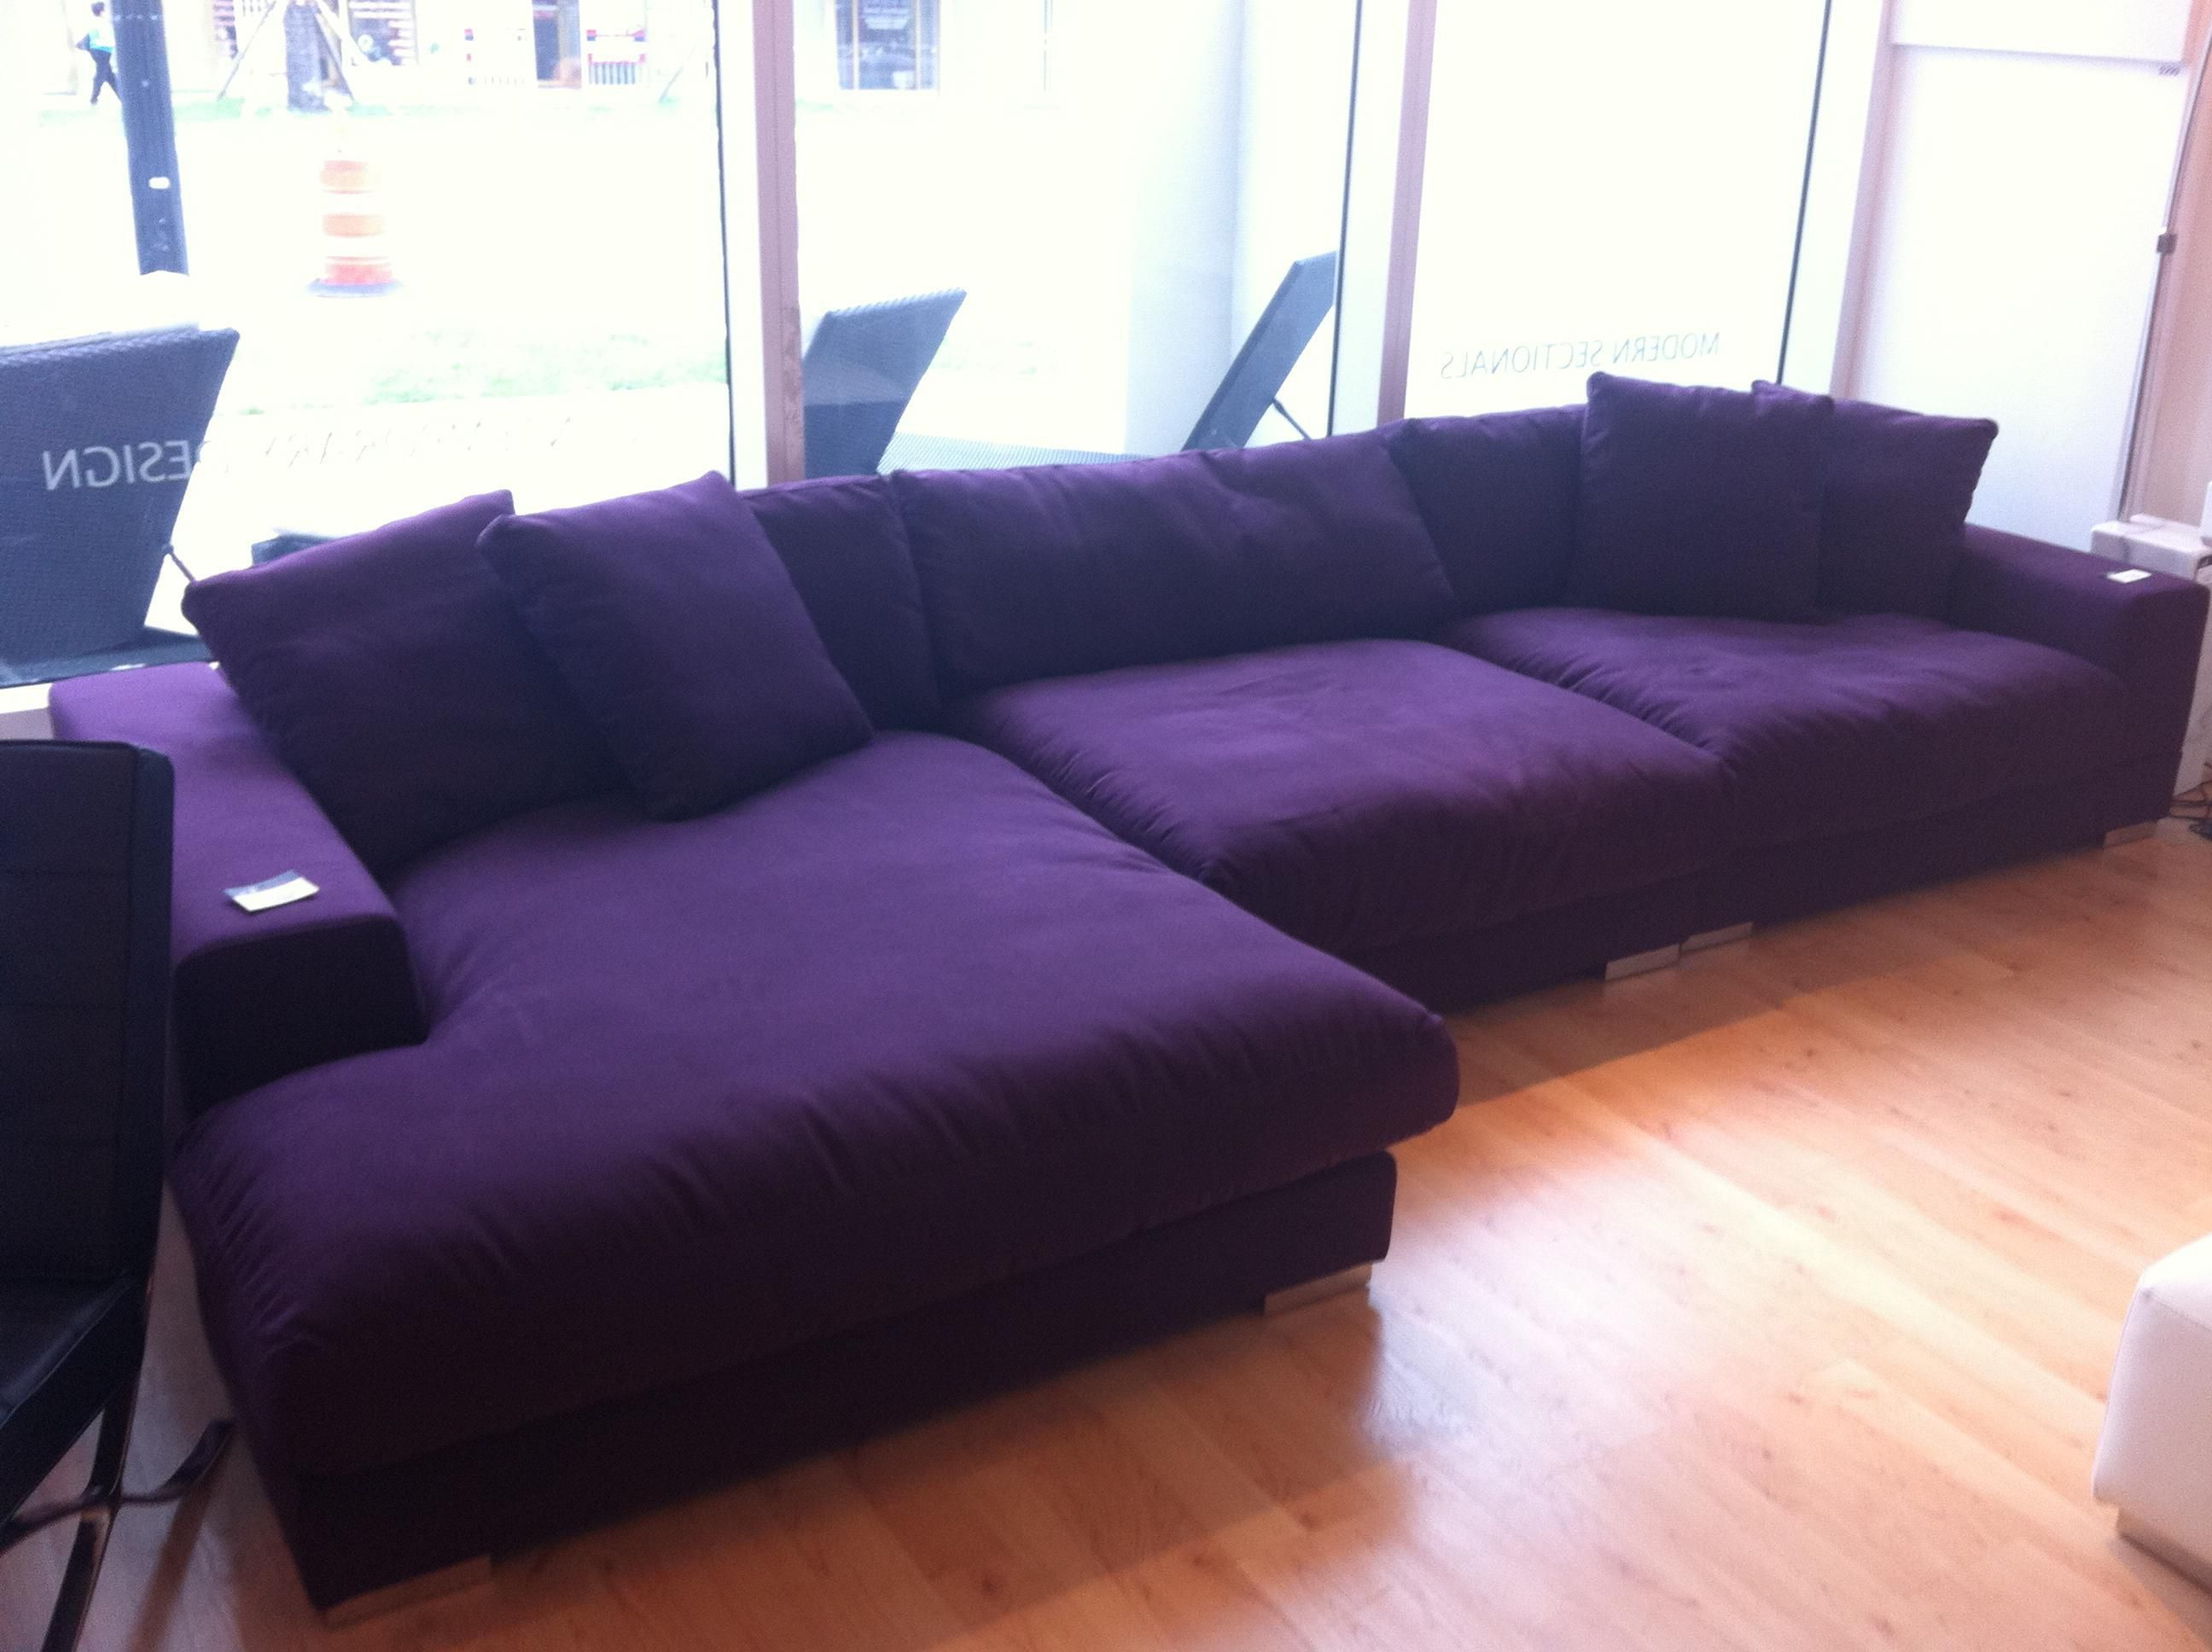 Purple Furniture Lovely Purple Furniture Best 25 Purple Furniture Ideas On Pinterest Purple Furniture Purple Furniture Purple Sofa Purple Living Room #purple #living #room #furniture #sets